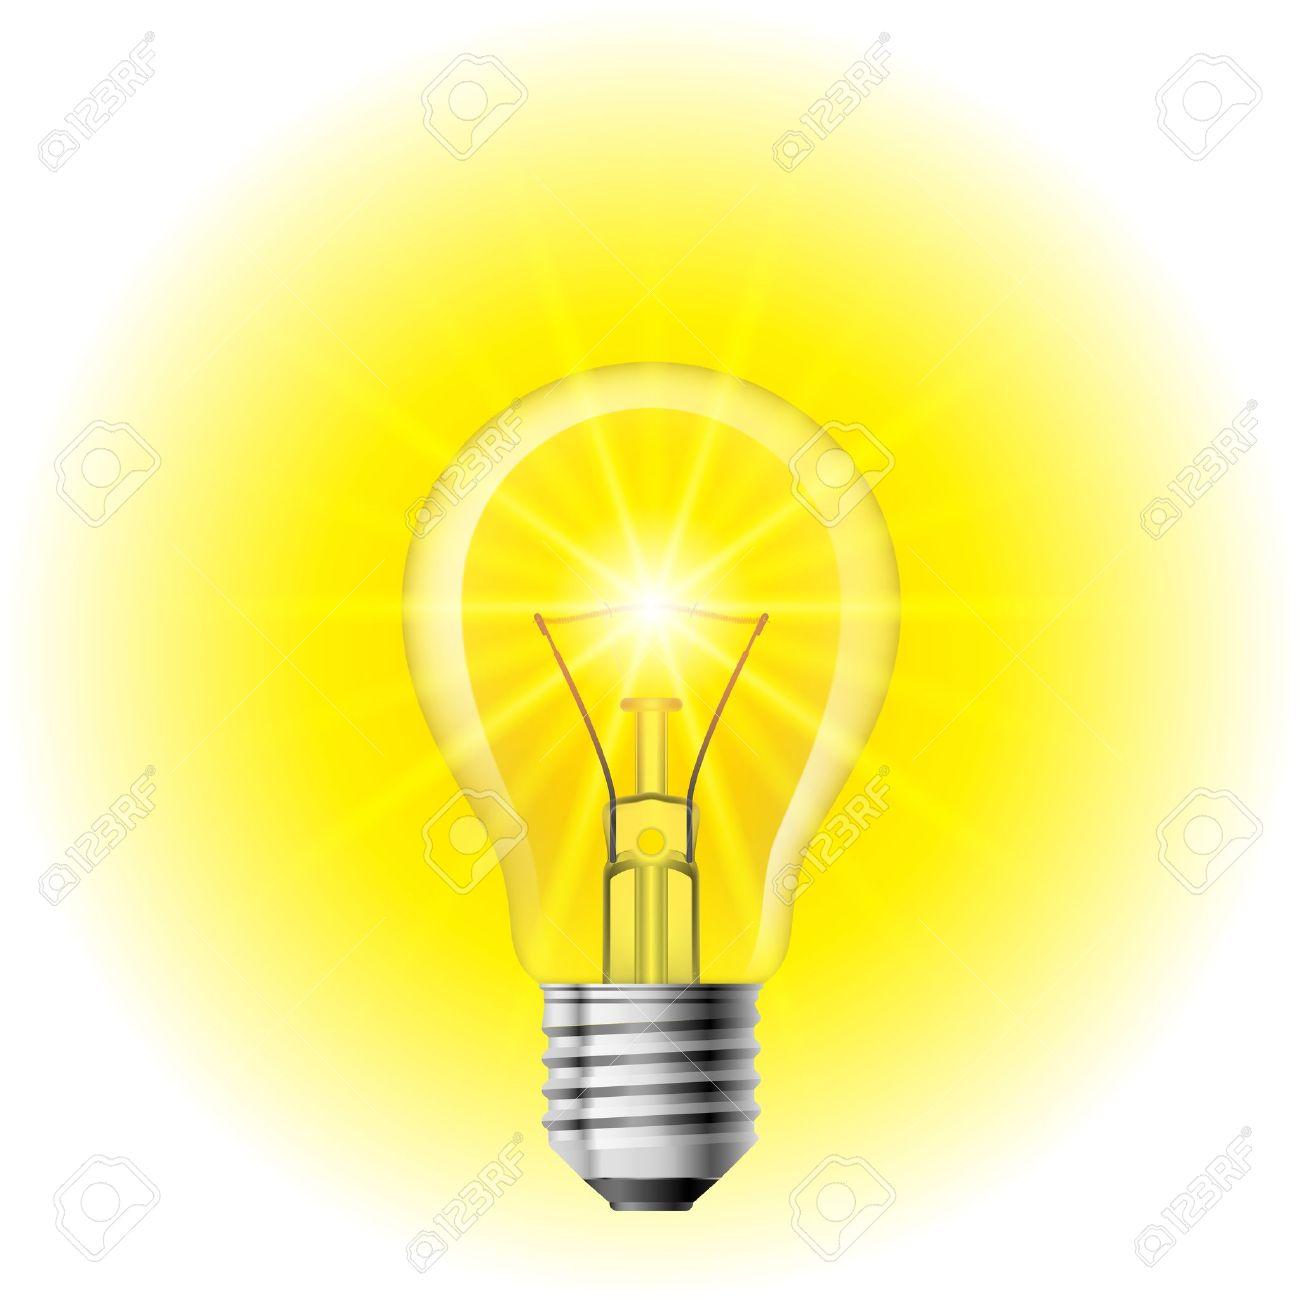 Light  Filament lamp on a white background. Illustration for design Stock Vector - 12676347